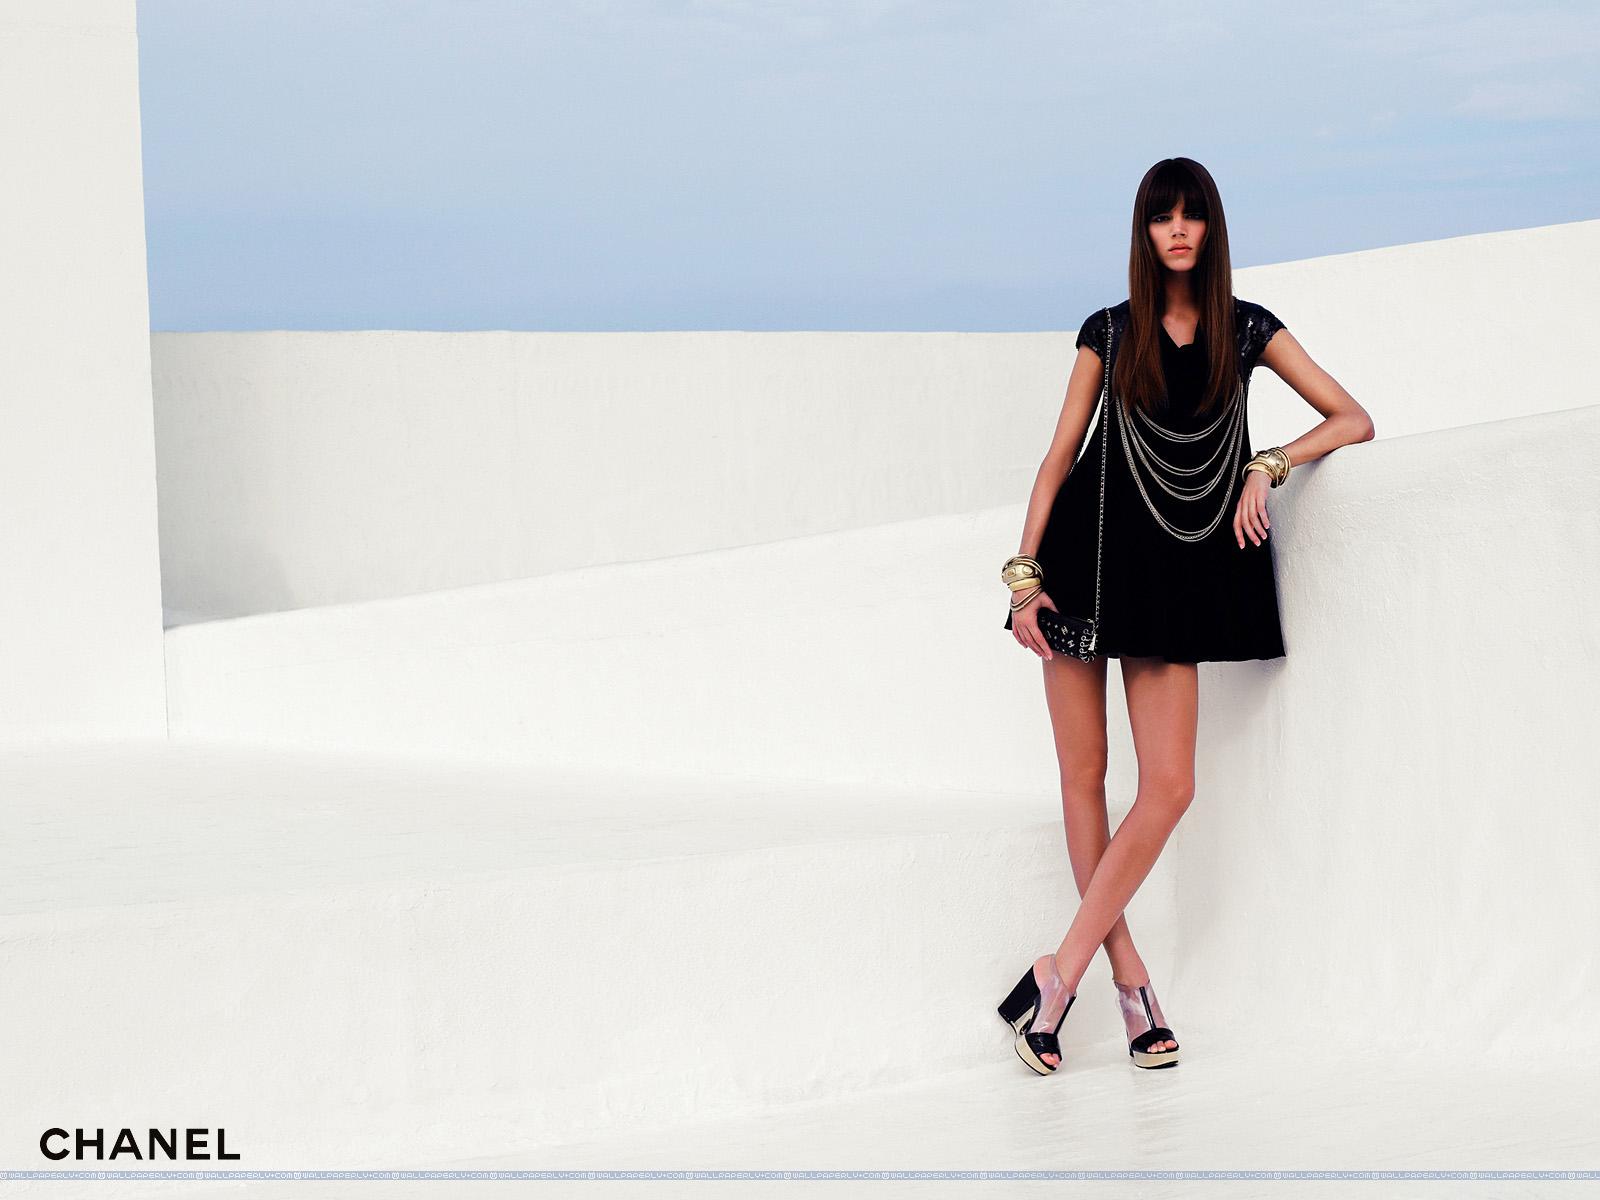 http://2.bp.blogspot.com/_lkIb025QBMU/S6-lZj7auCI/AAAAAAAAATM/V-wFI0GwcWQ/s1600/Chanel+Spring+-+Summer+2007+23+1600x1200+Fashion+Wallpaper.jpg